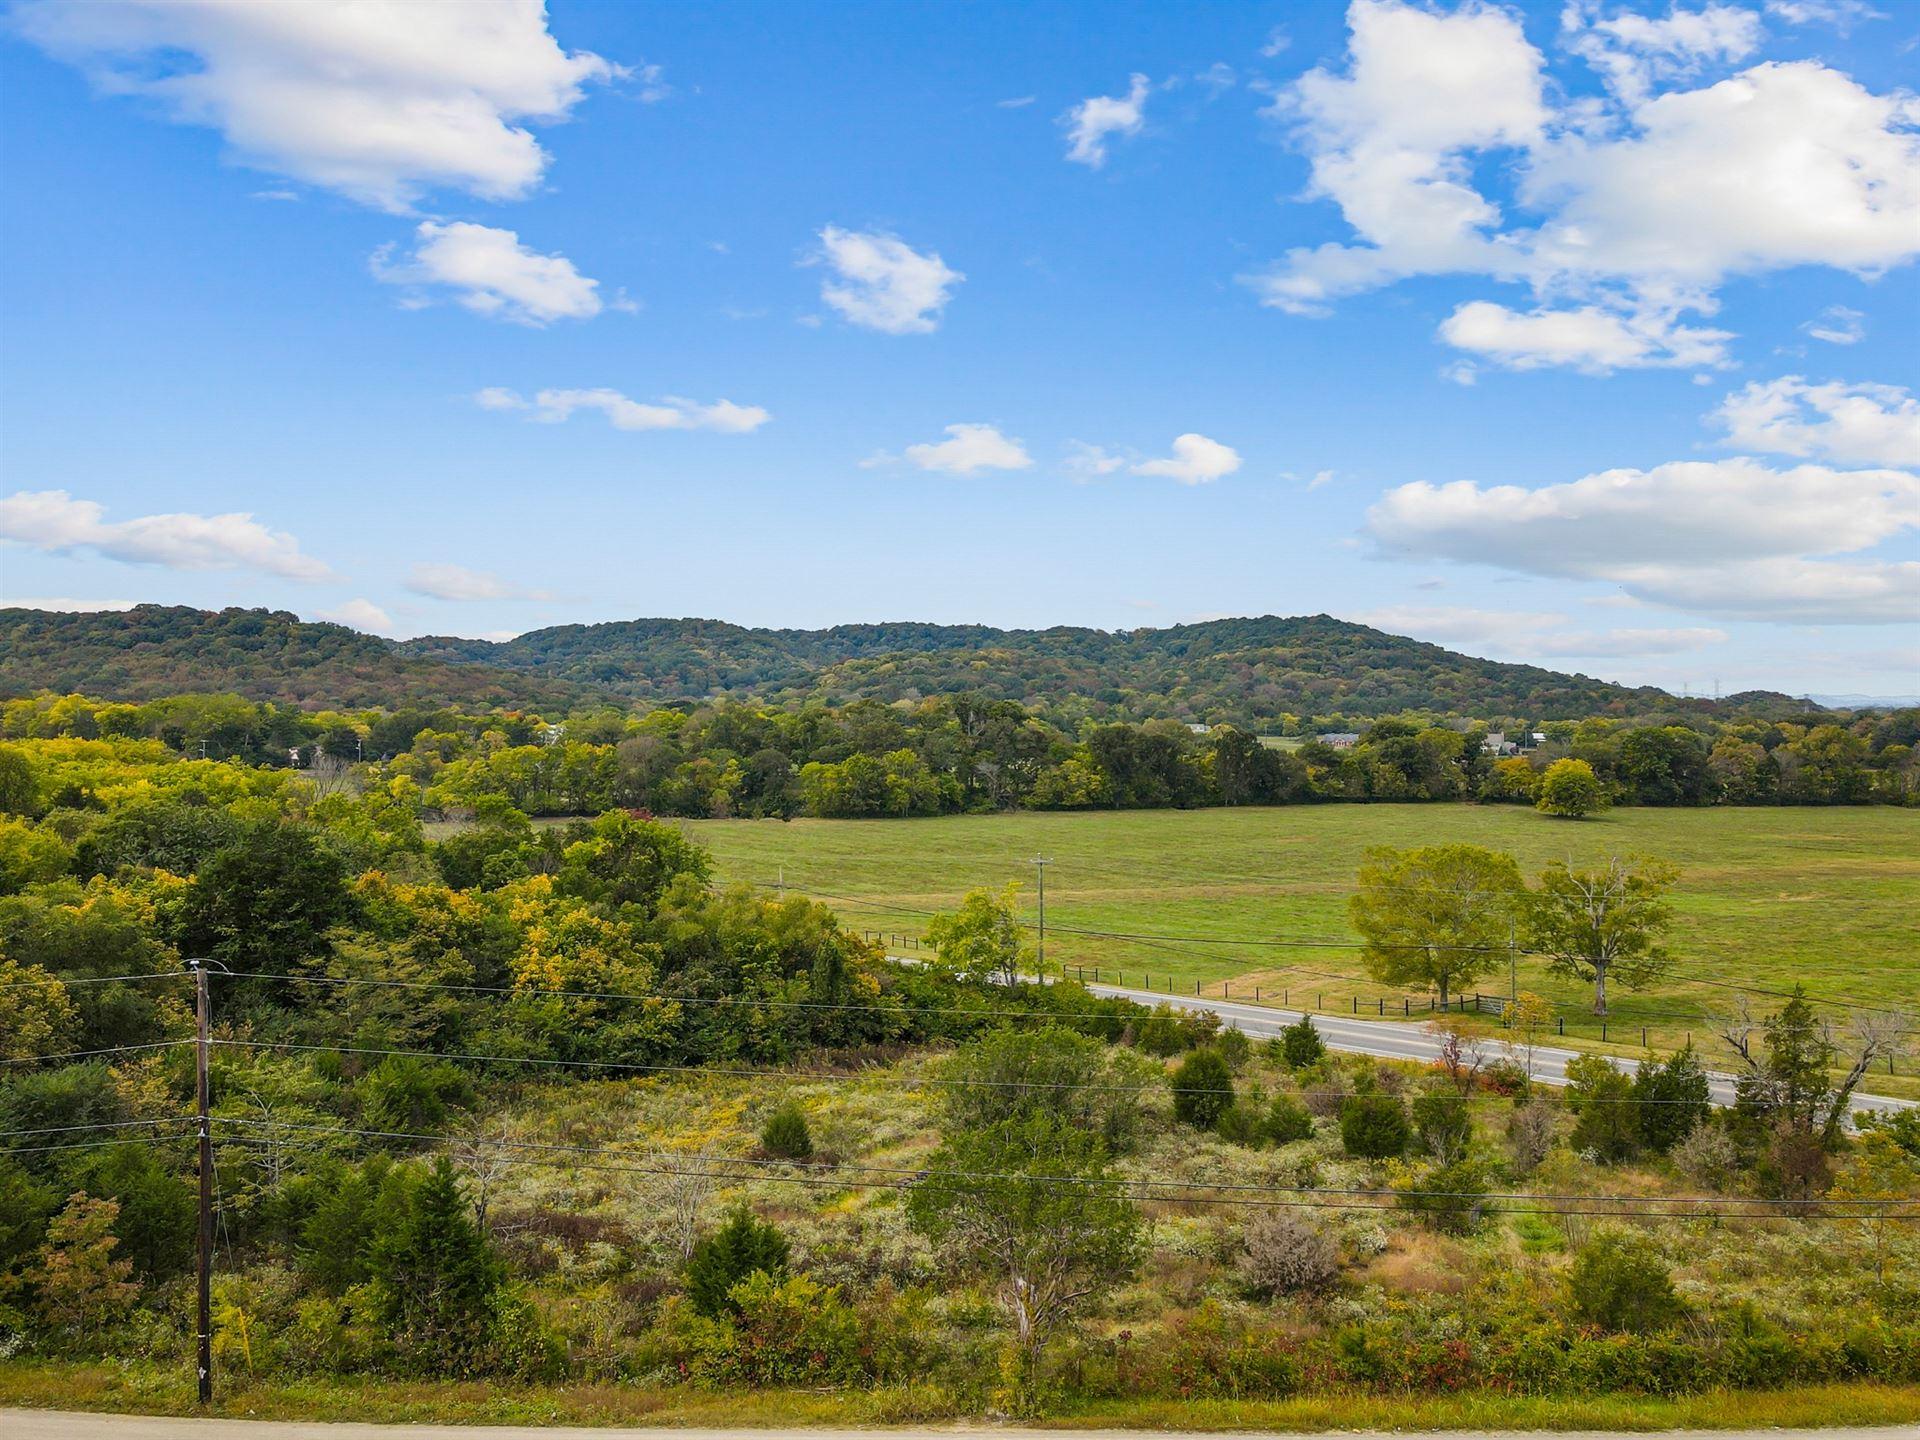 Photo of 444 Beech Creek Rd N, Brentwood, TN 37027 (MLS # 2228426)